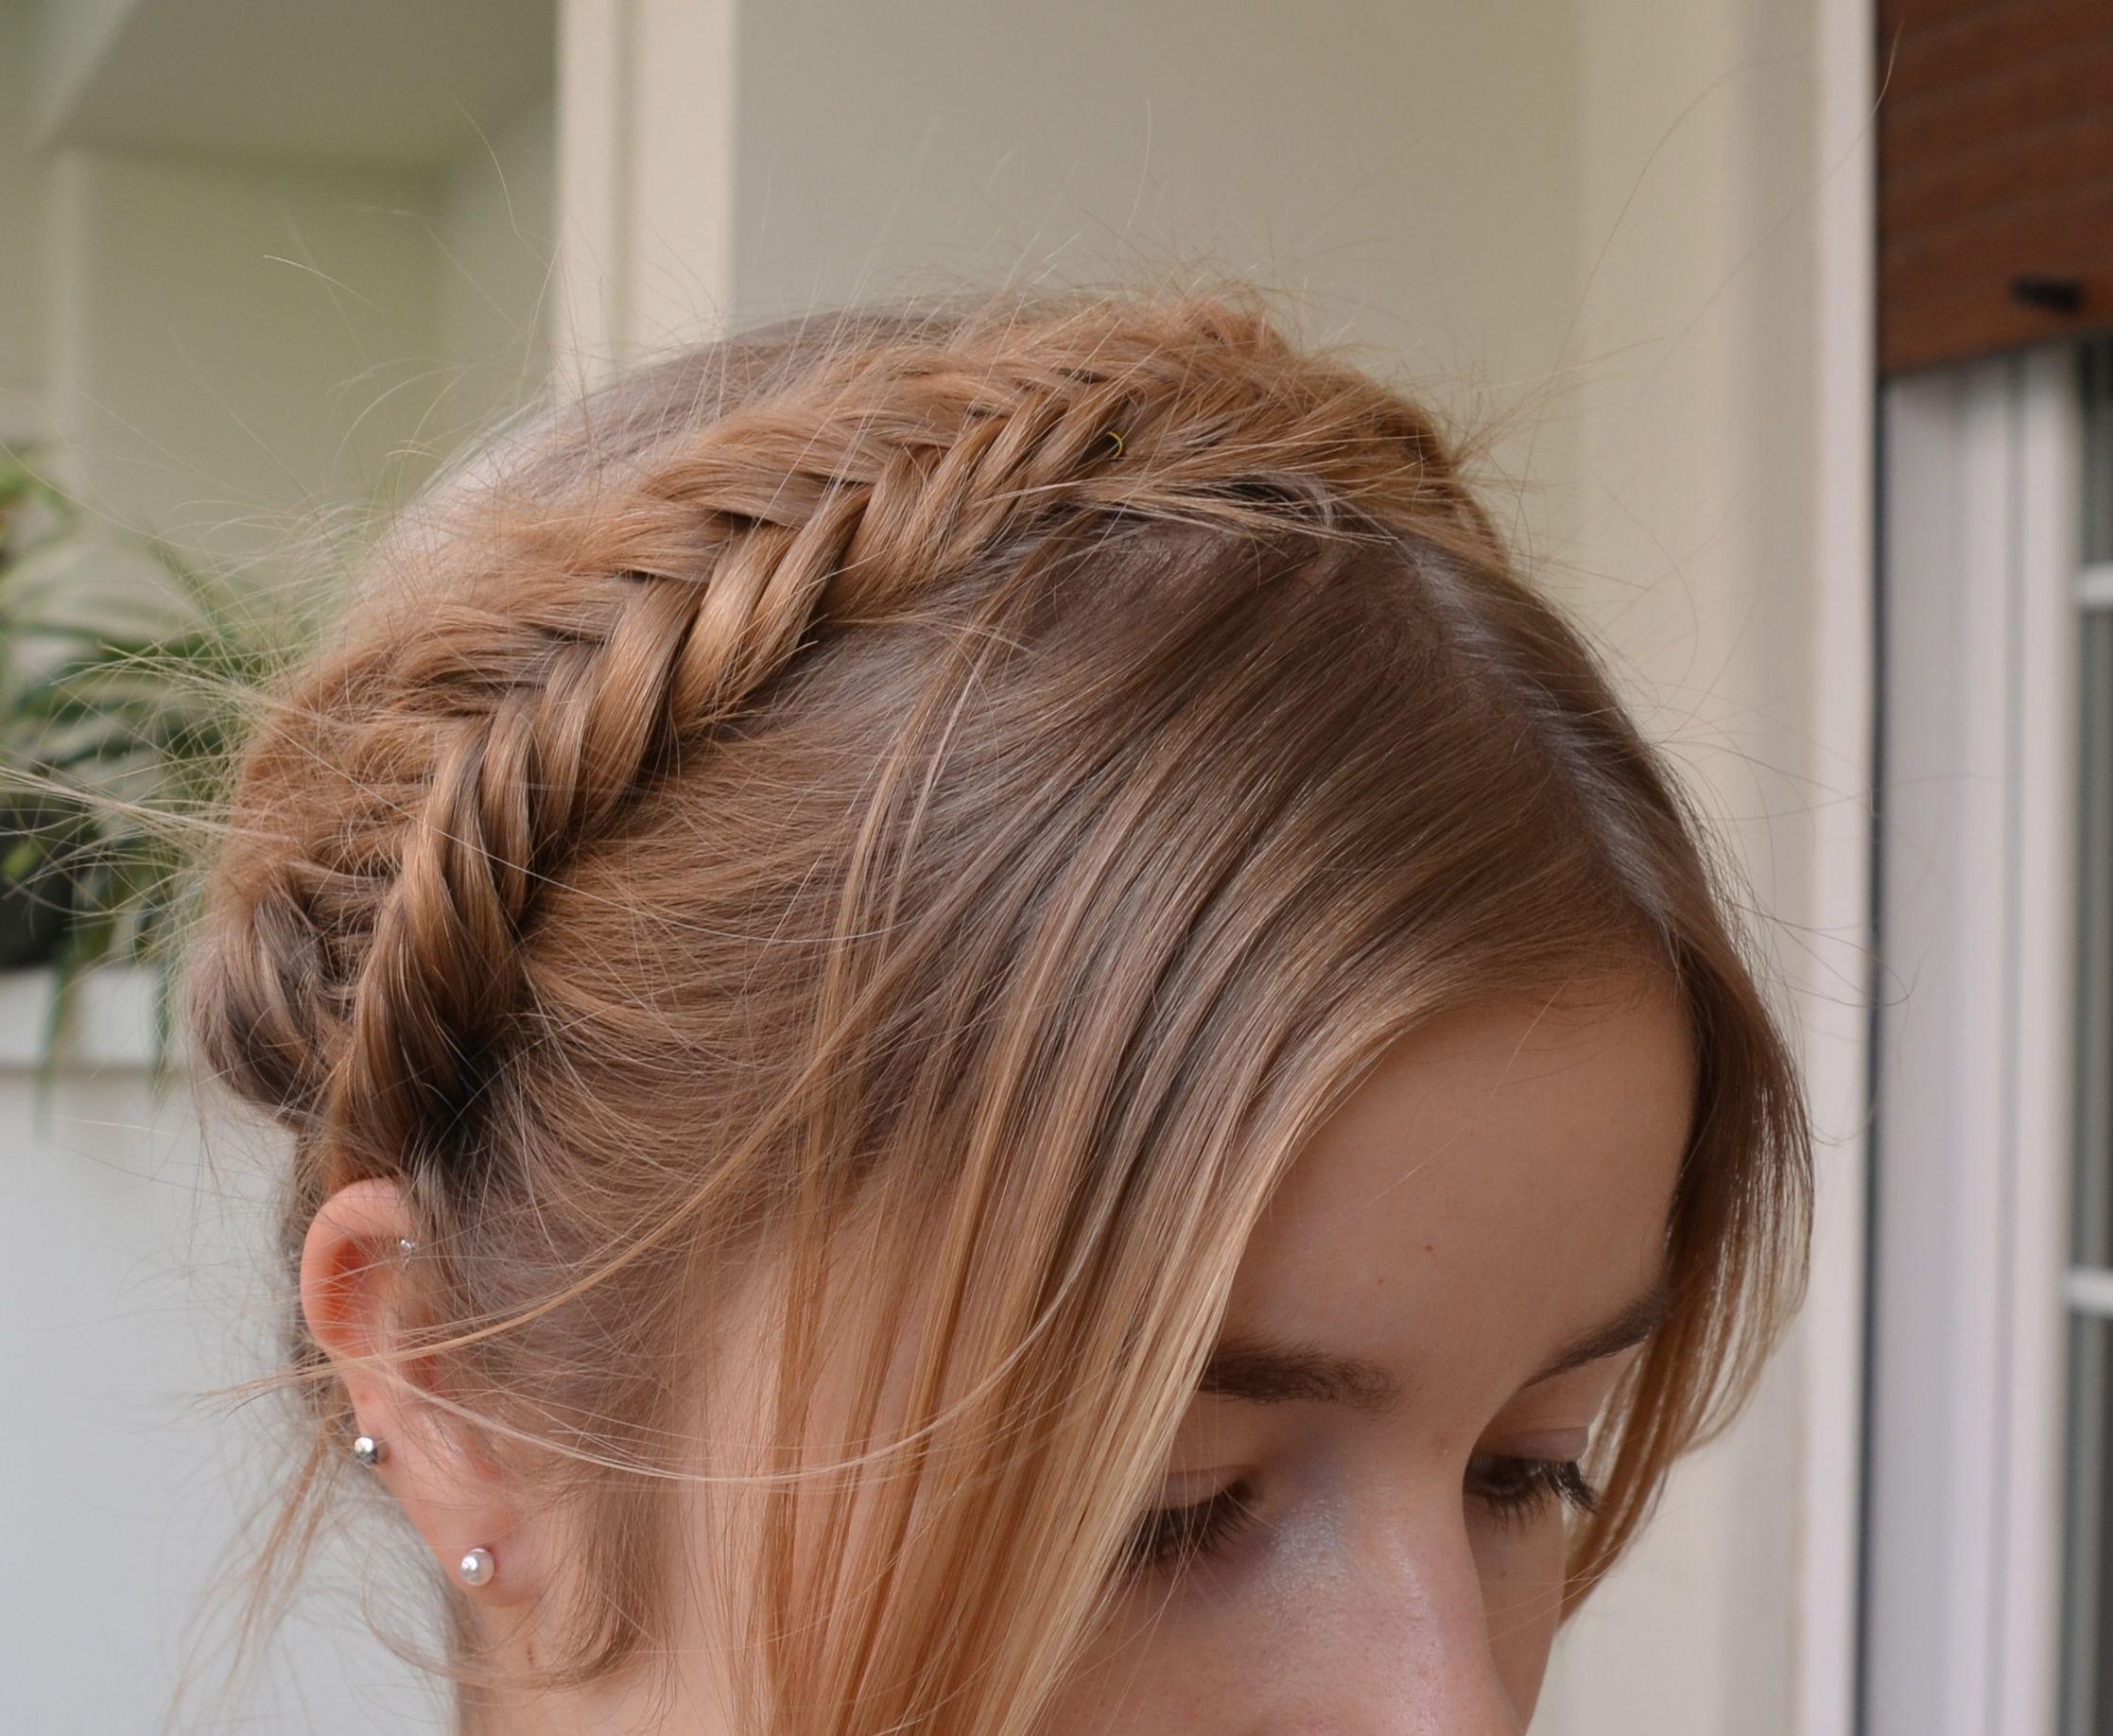 Fishtail milkmaid braid homemade hairstyles pinterest milkmaid